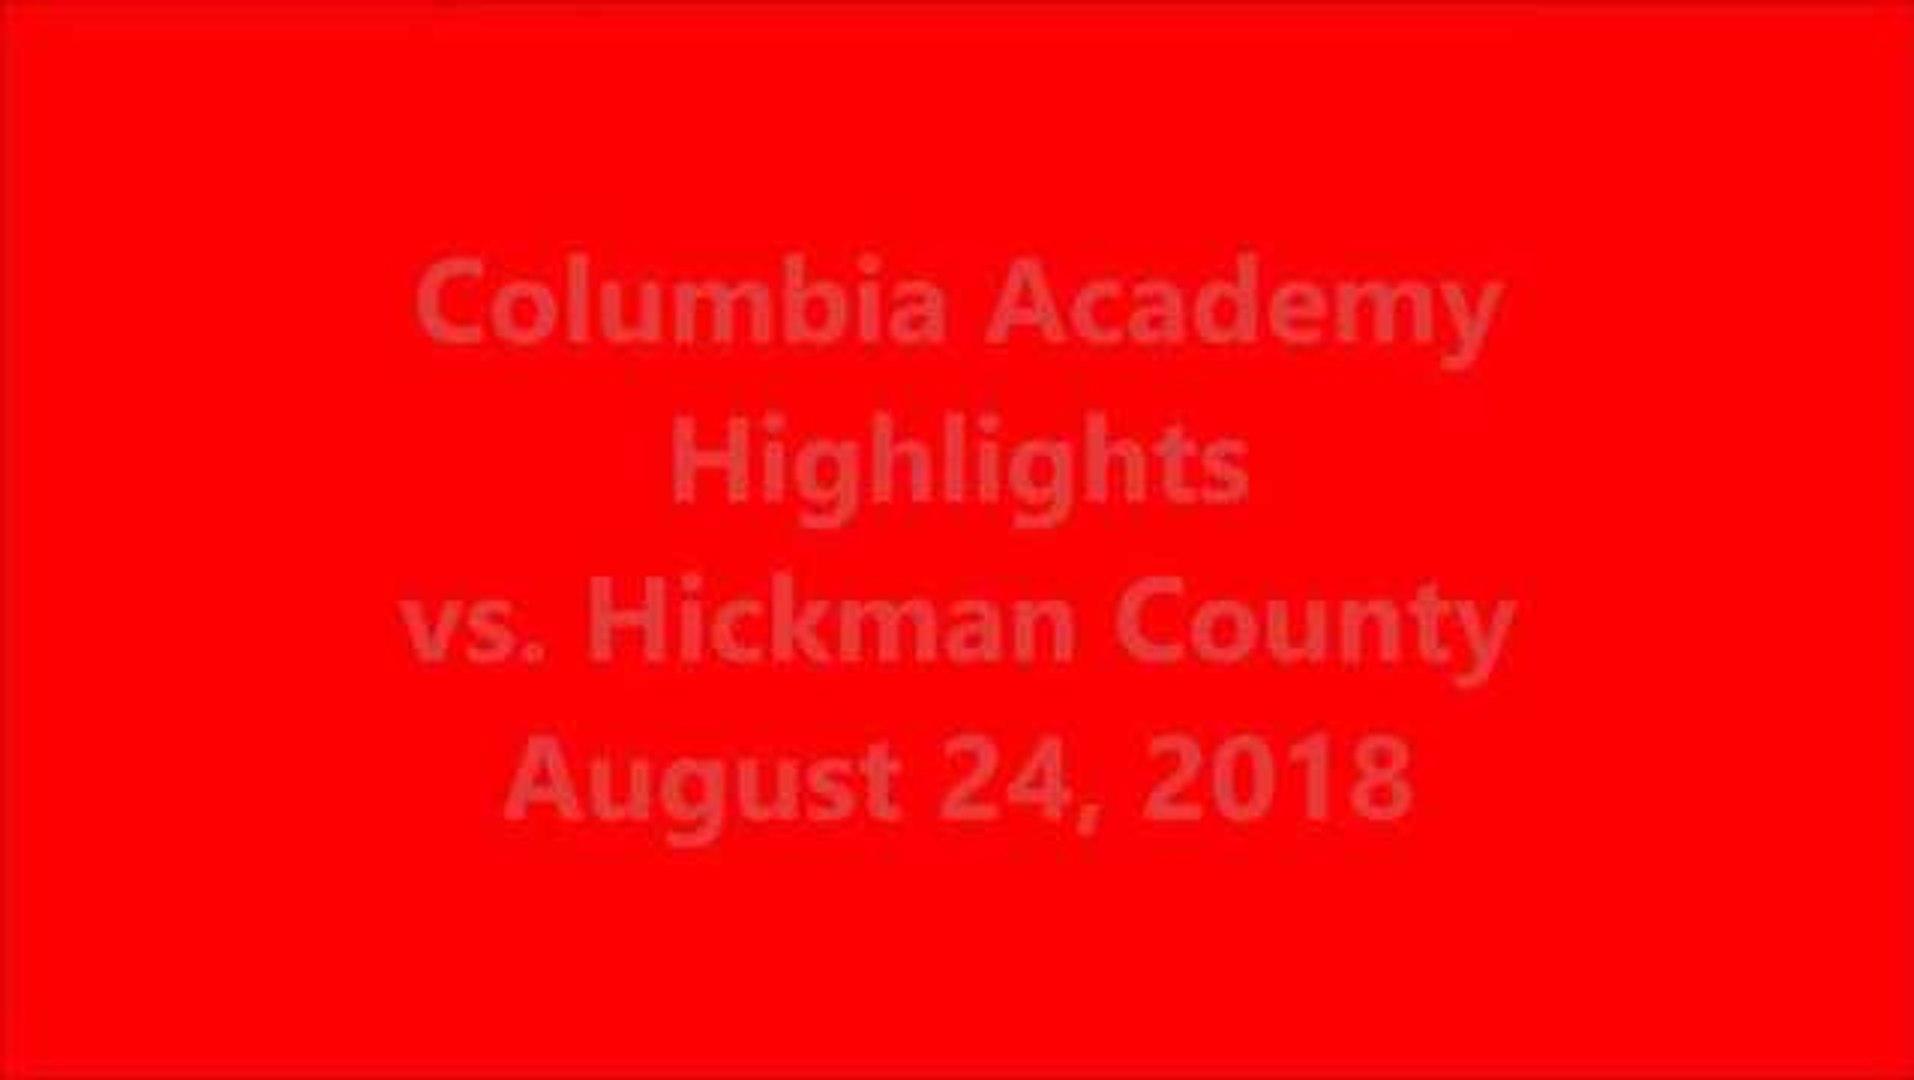 Columbia Academy Highlights